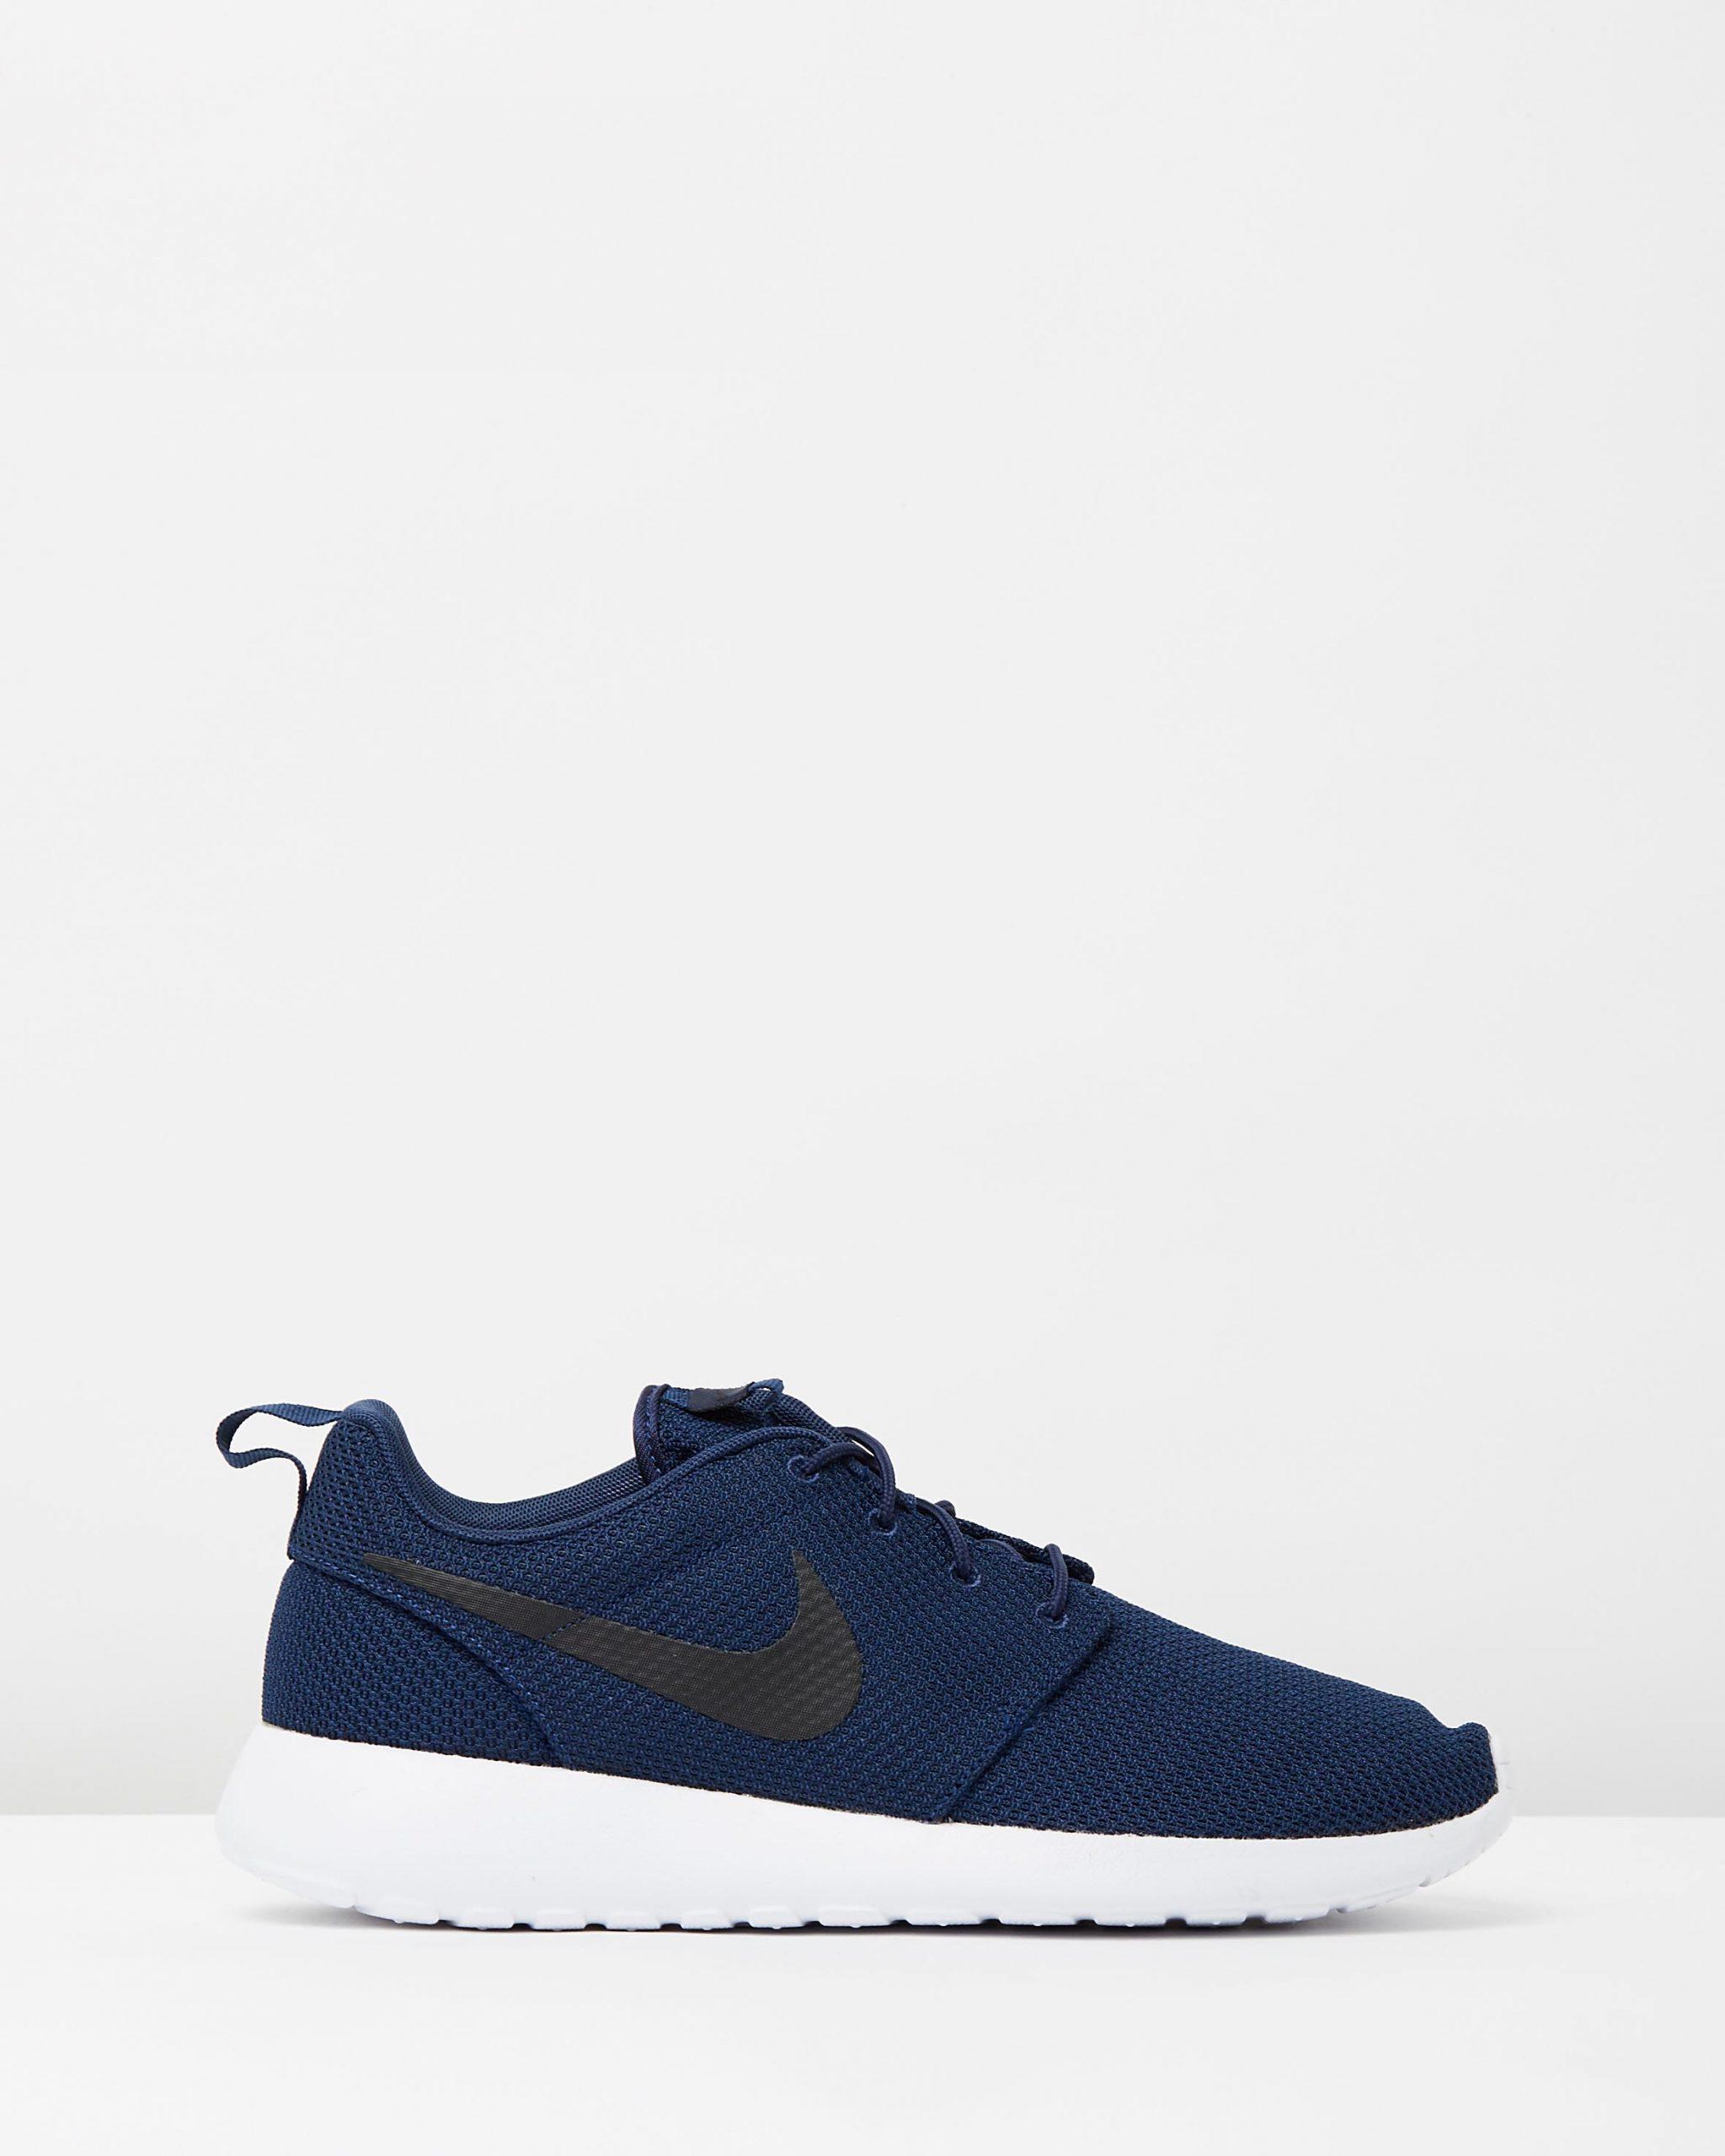 Nike Mens Roshe One Midnight Navy/Black/White